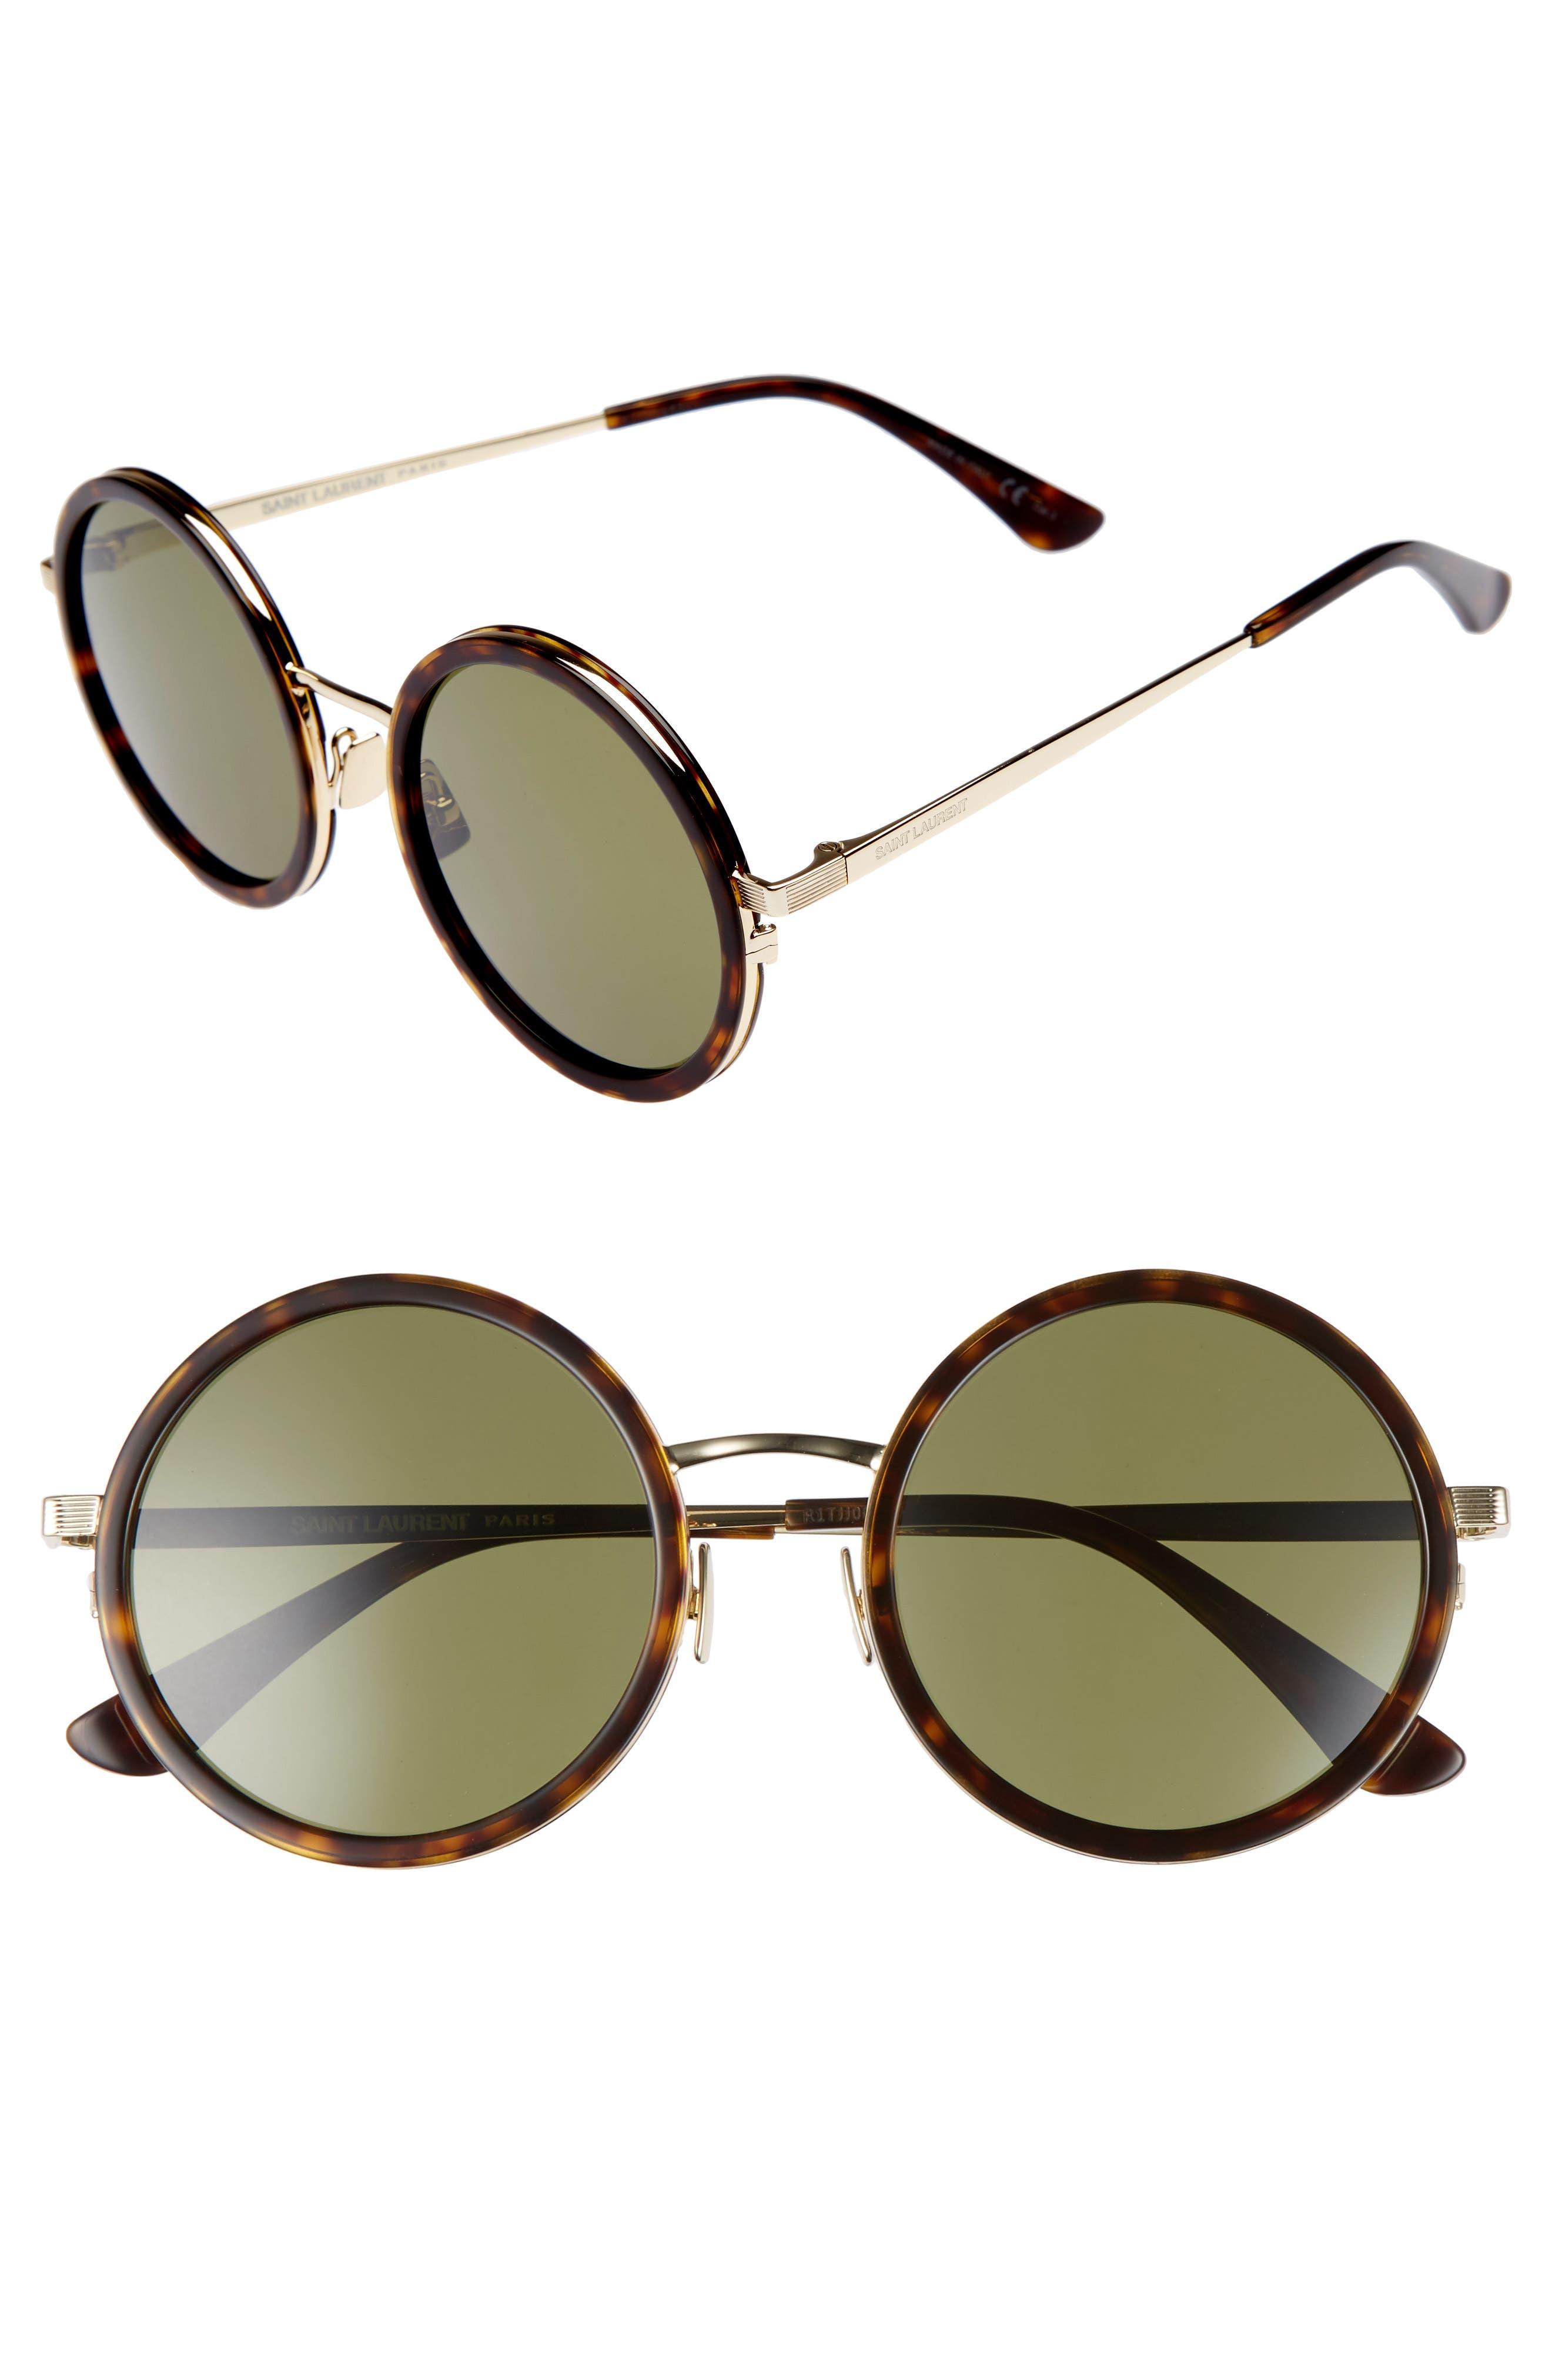 52mm Round Sunglasses,                             Main thumbnail 1, color,                             200